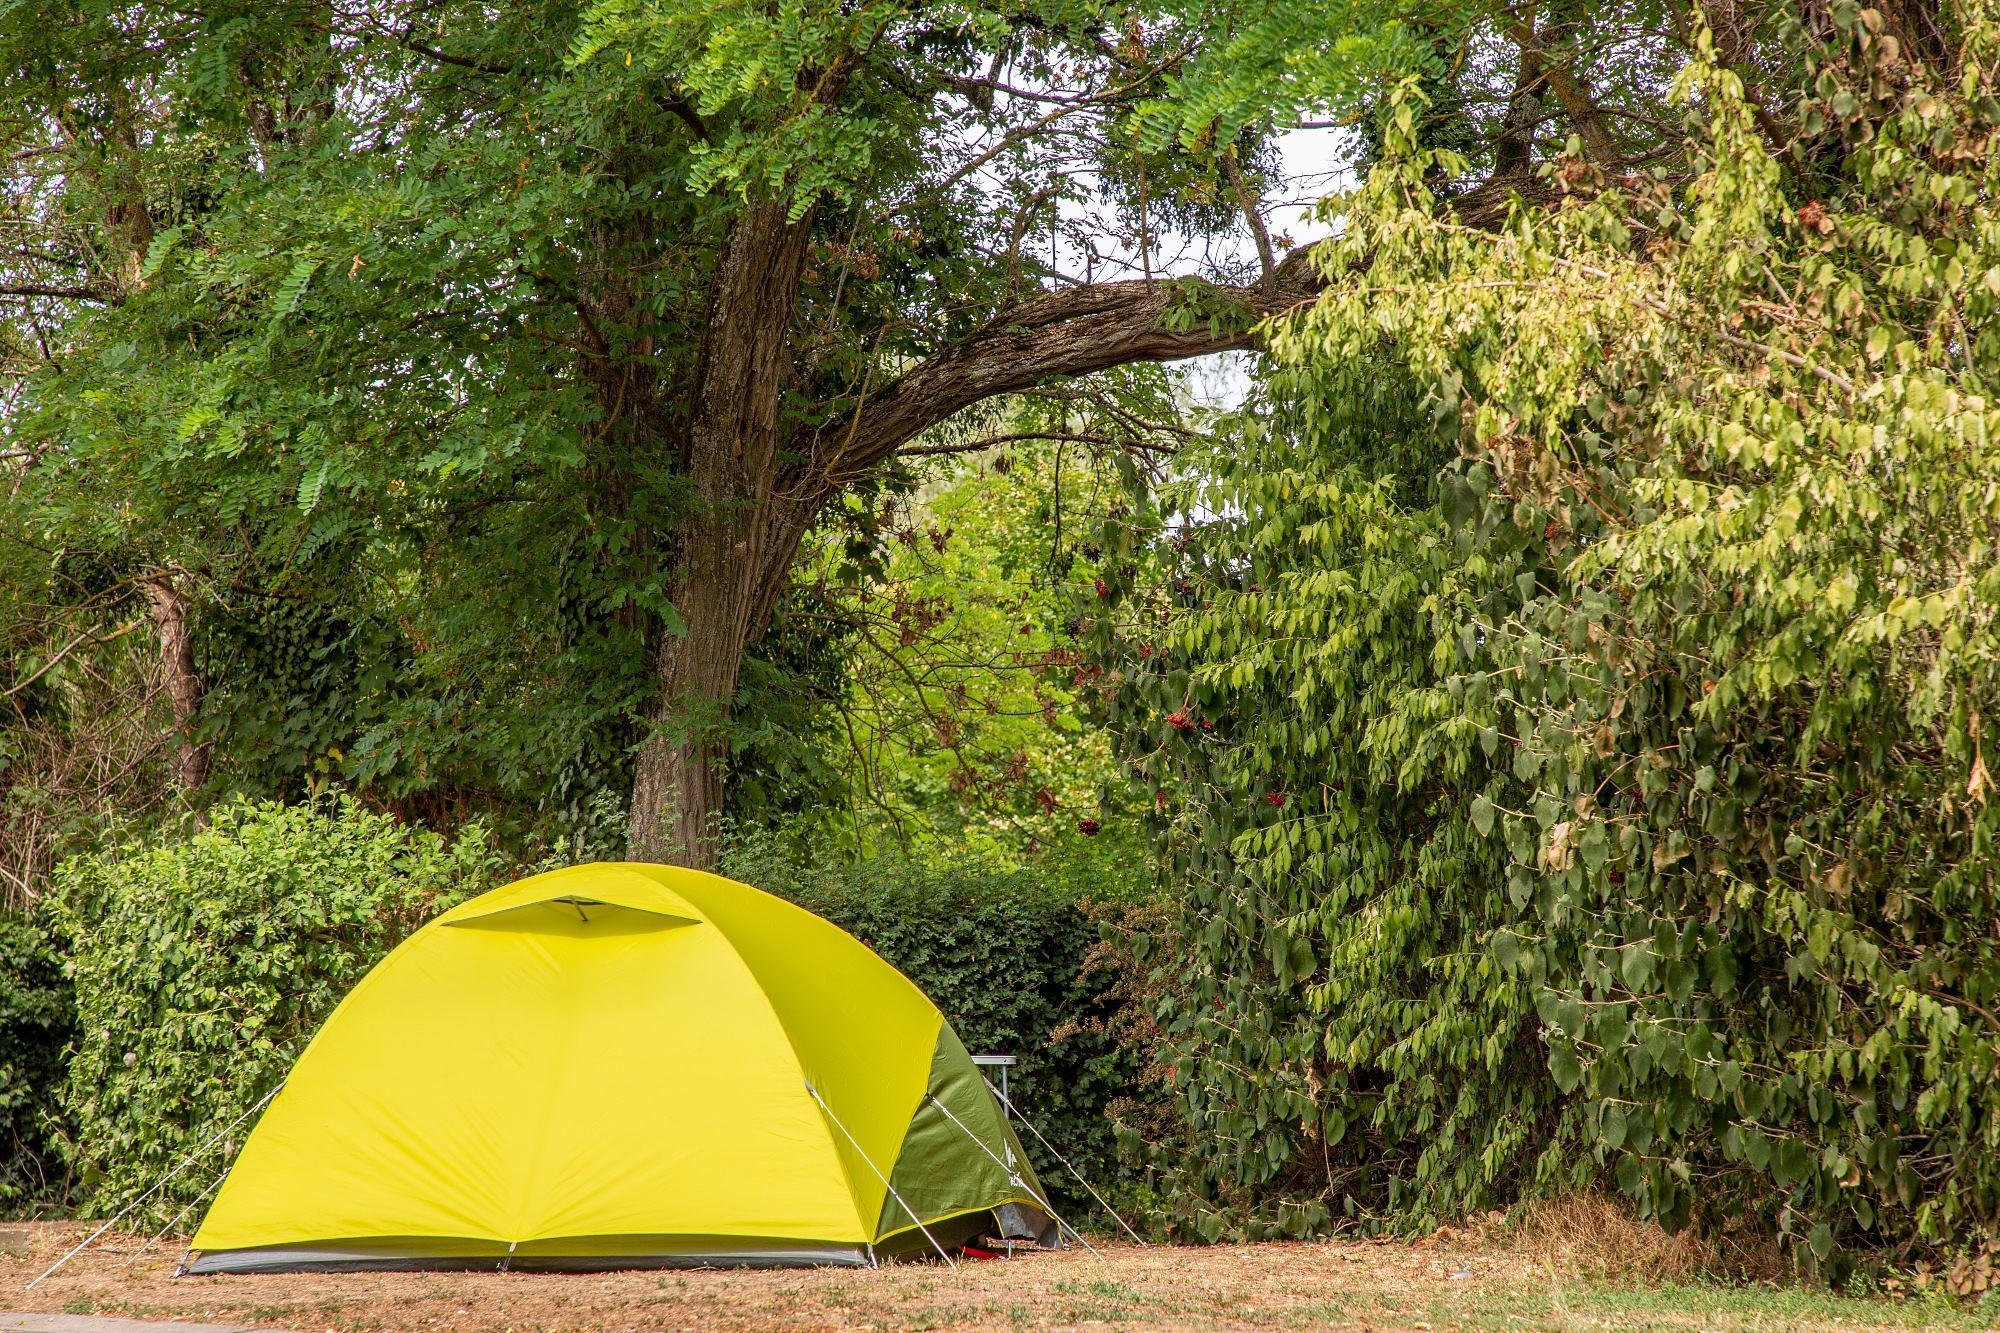 Emplacement - Halte Cyclo/Rando : Sans Véhicule Ni Éléctricité - Camping Robinson